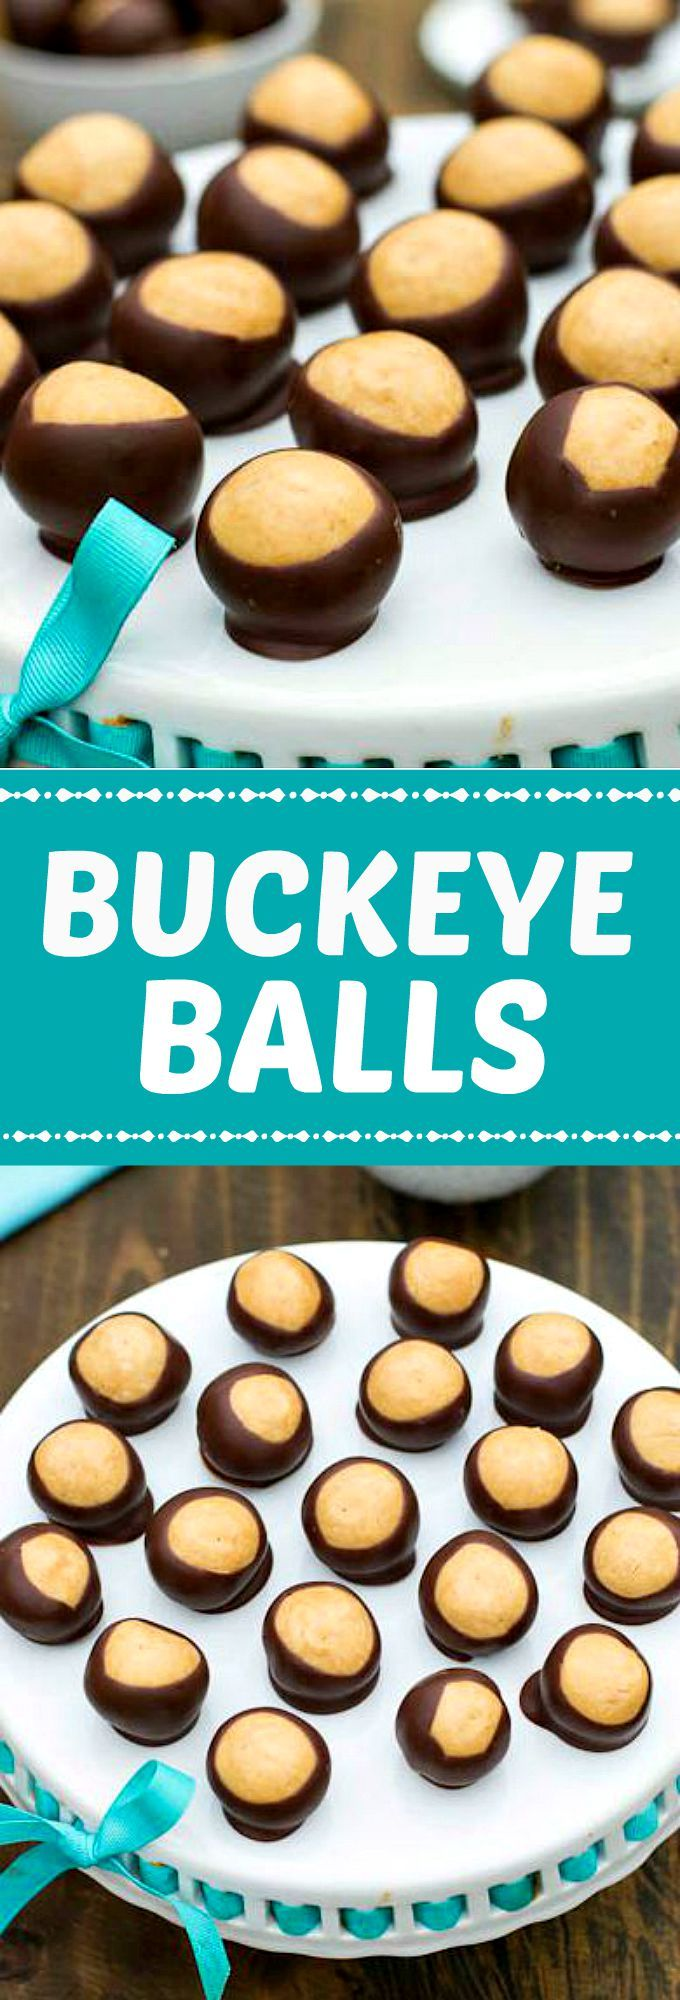 Buckeye Balls - chocolate and peanut butter heaven!